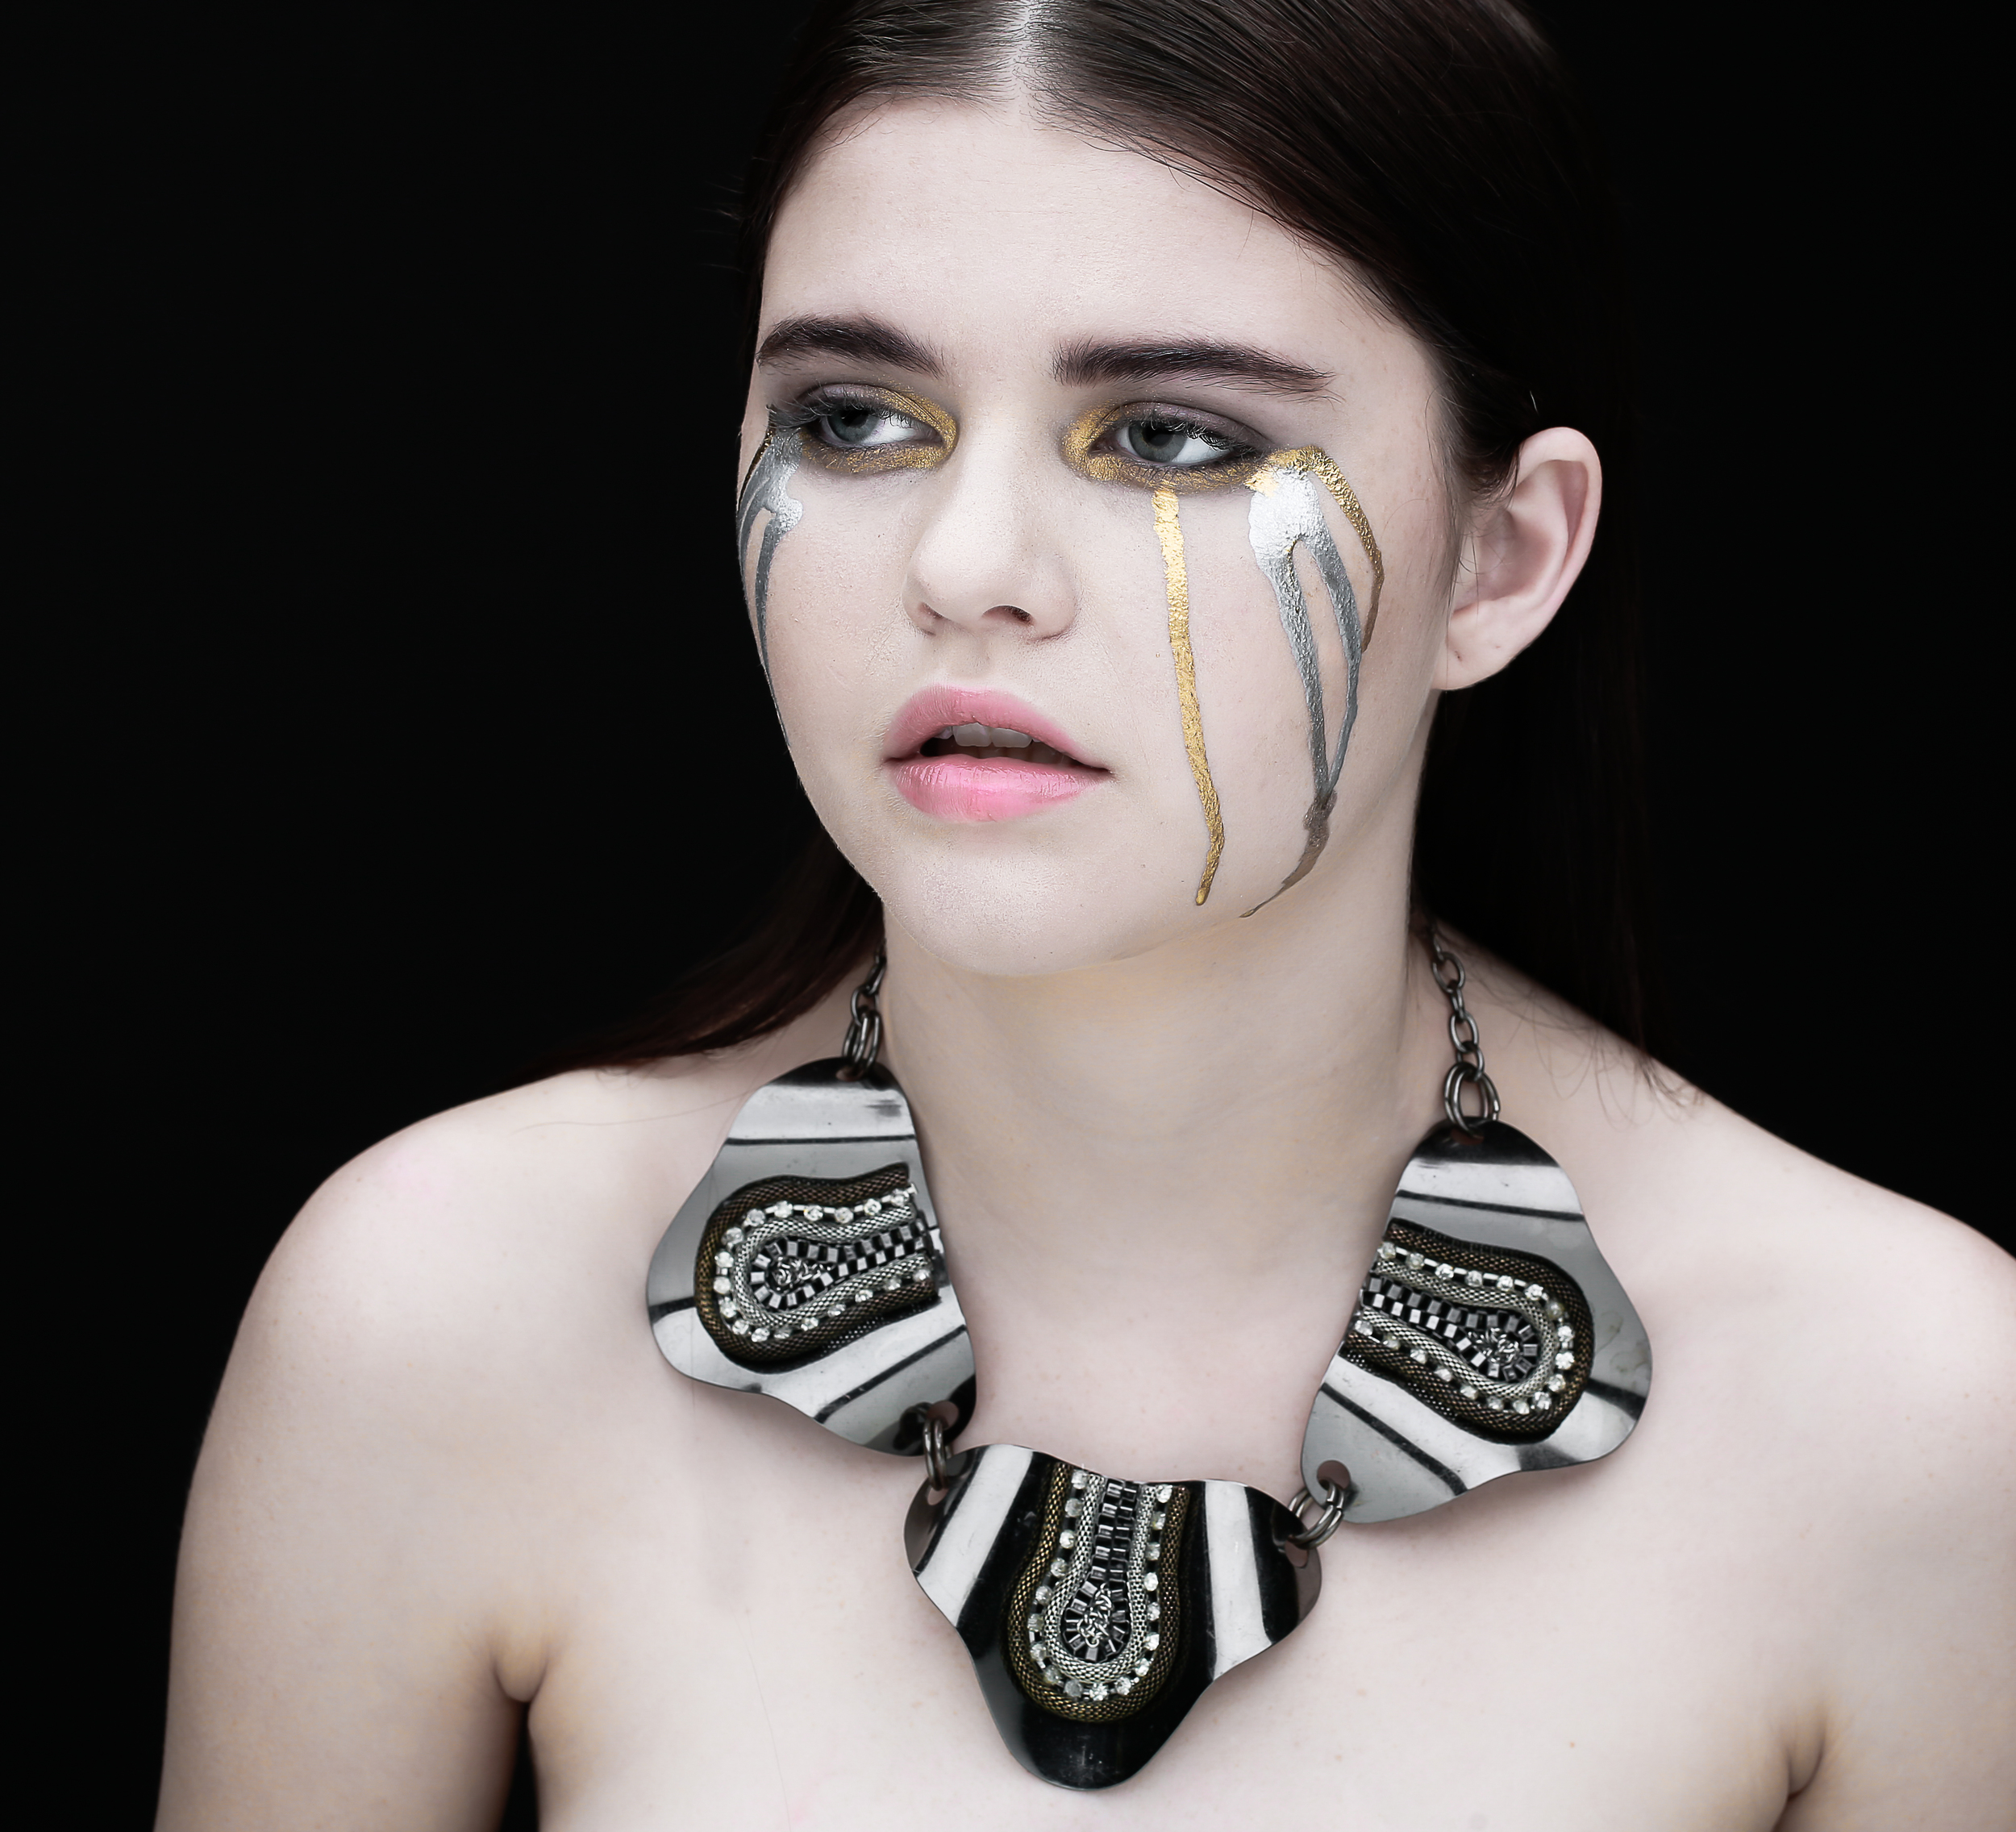 Photographer: Peter Lueders - Makeup: Jake Aebly - Hair: Valentina De Leo - Model: Kelsey Noyes